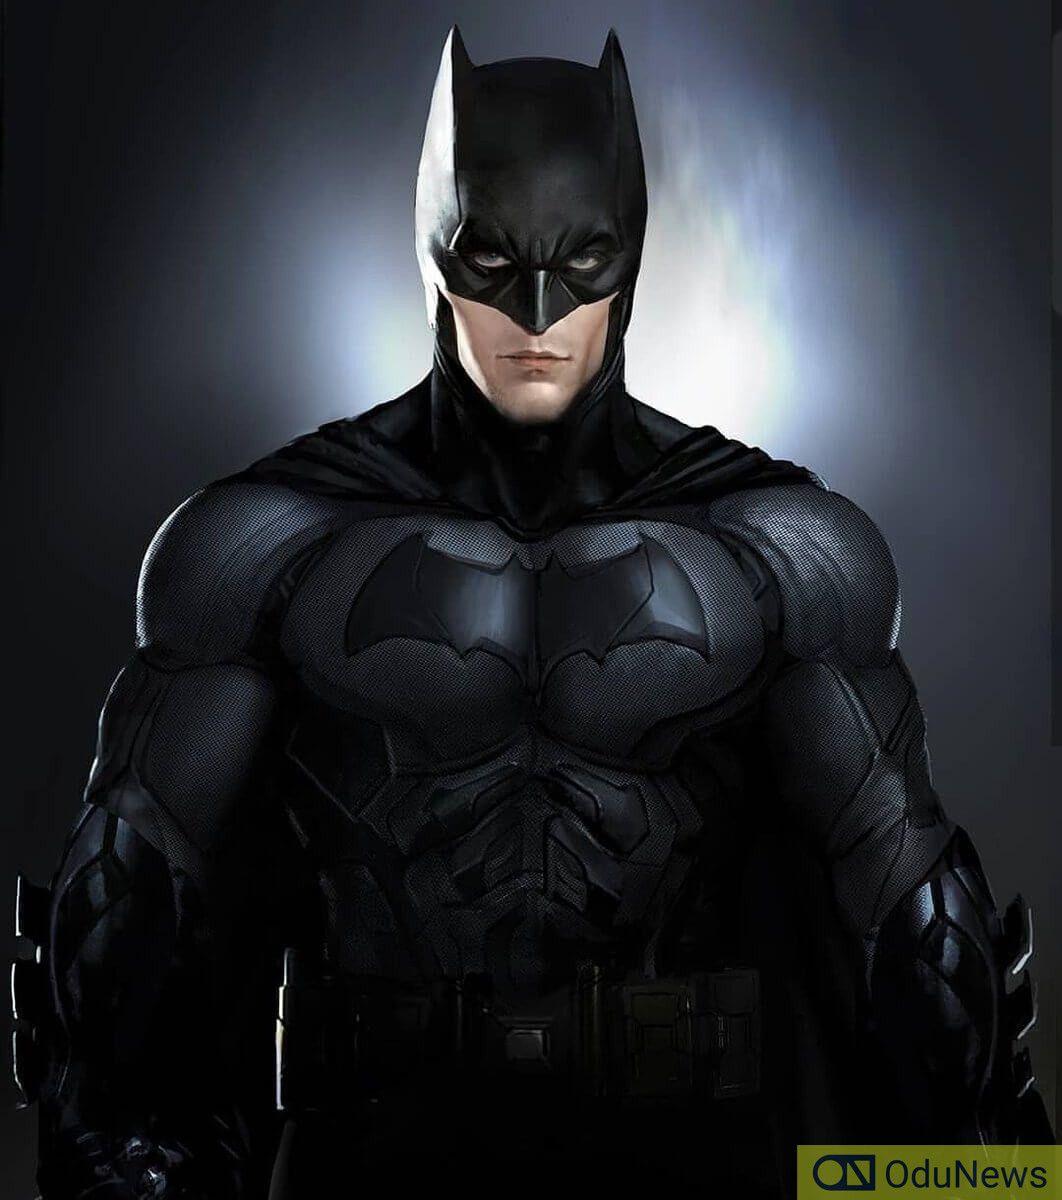 'The Batman' Set Photos Reveal Robert Pattinson's Full